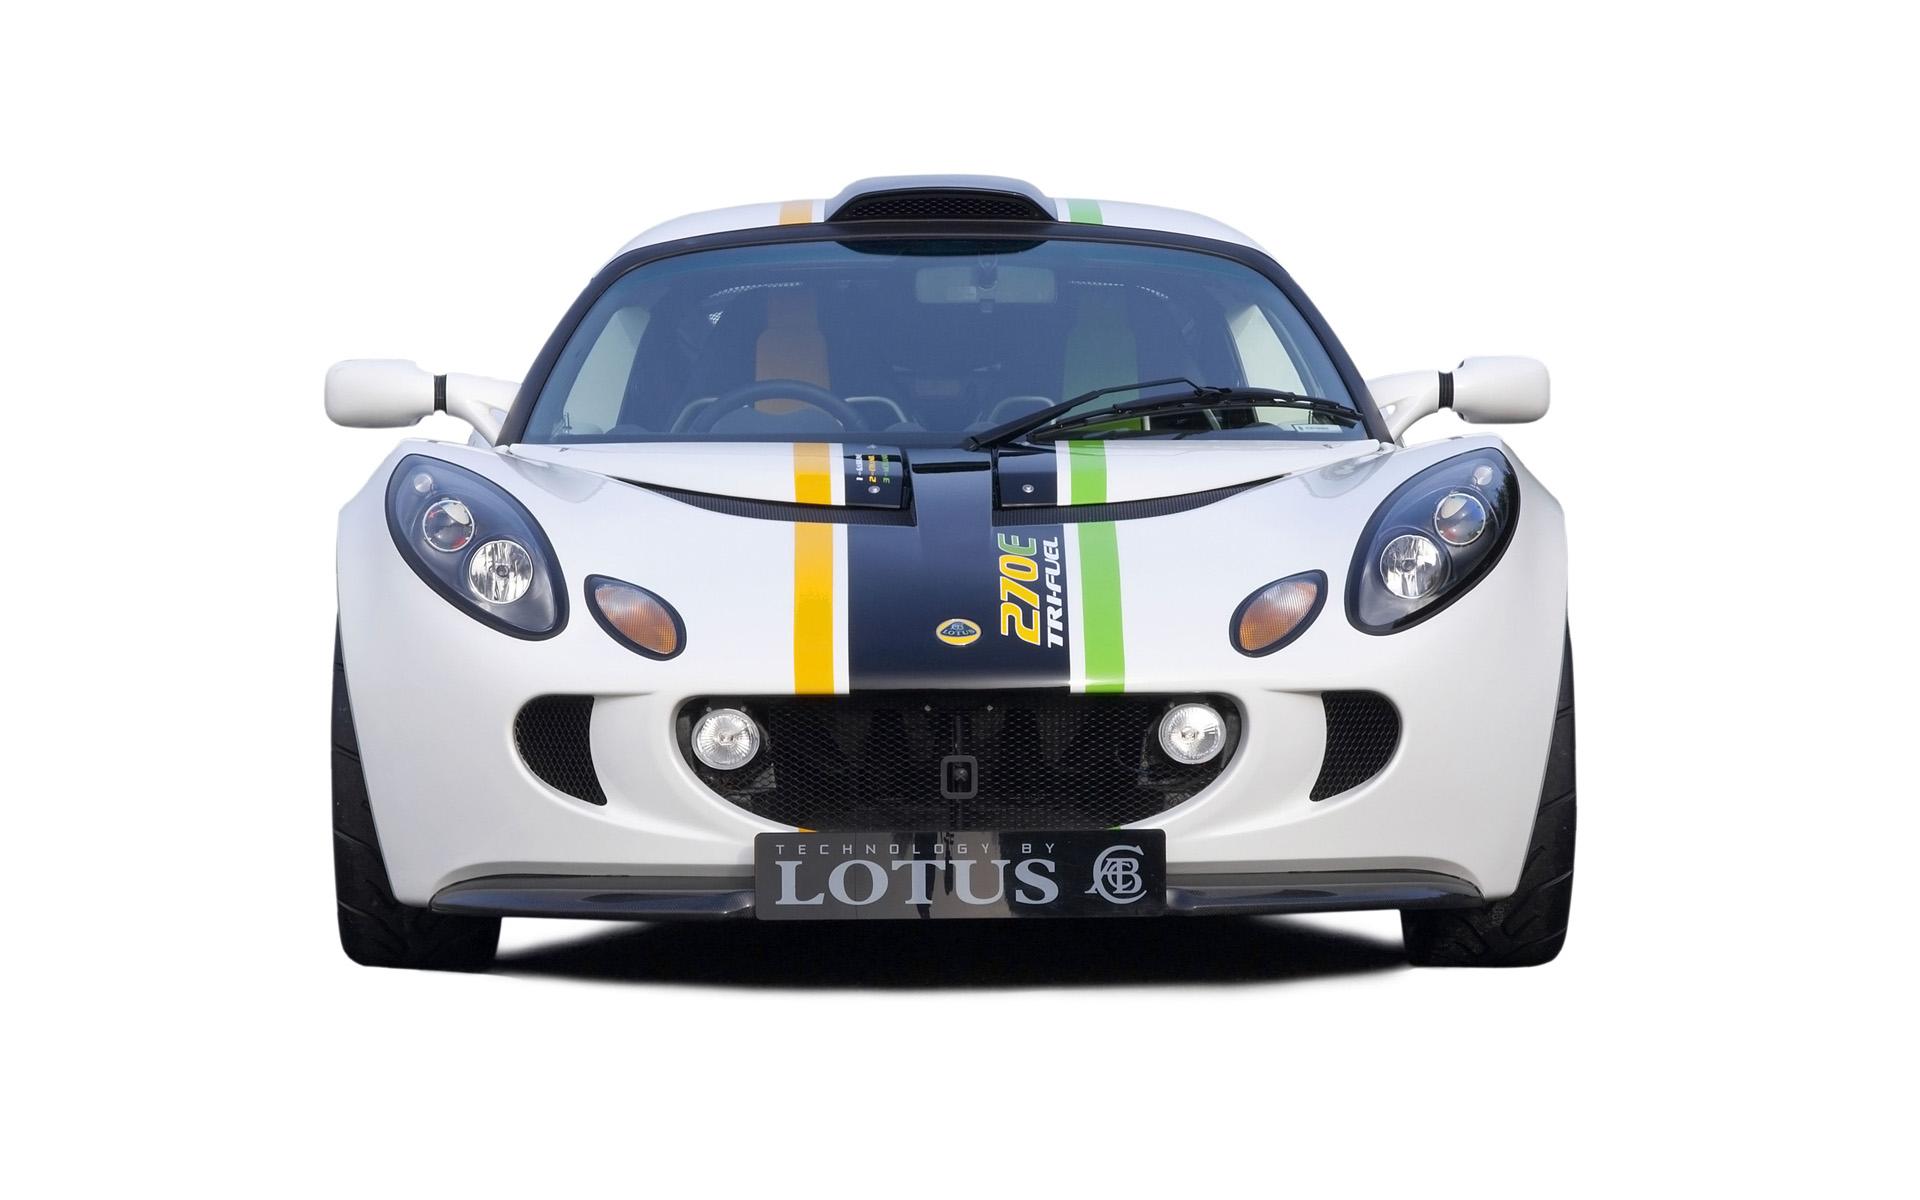 http://www.conceptcarz.com/images/Lotus/2008-Lotus-Exige-270E-Tri-Fuel-Static-image-01.jpg